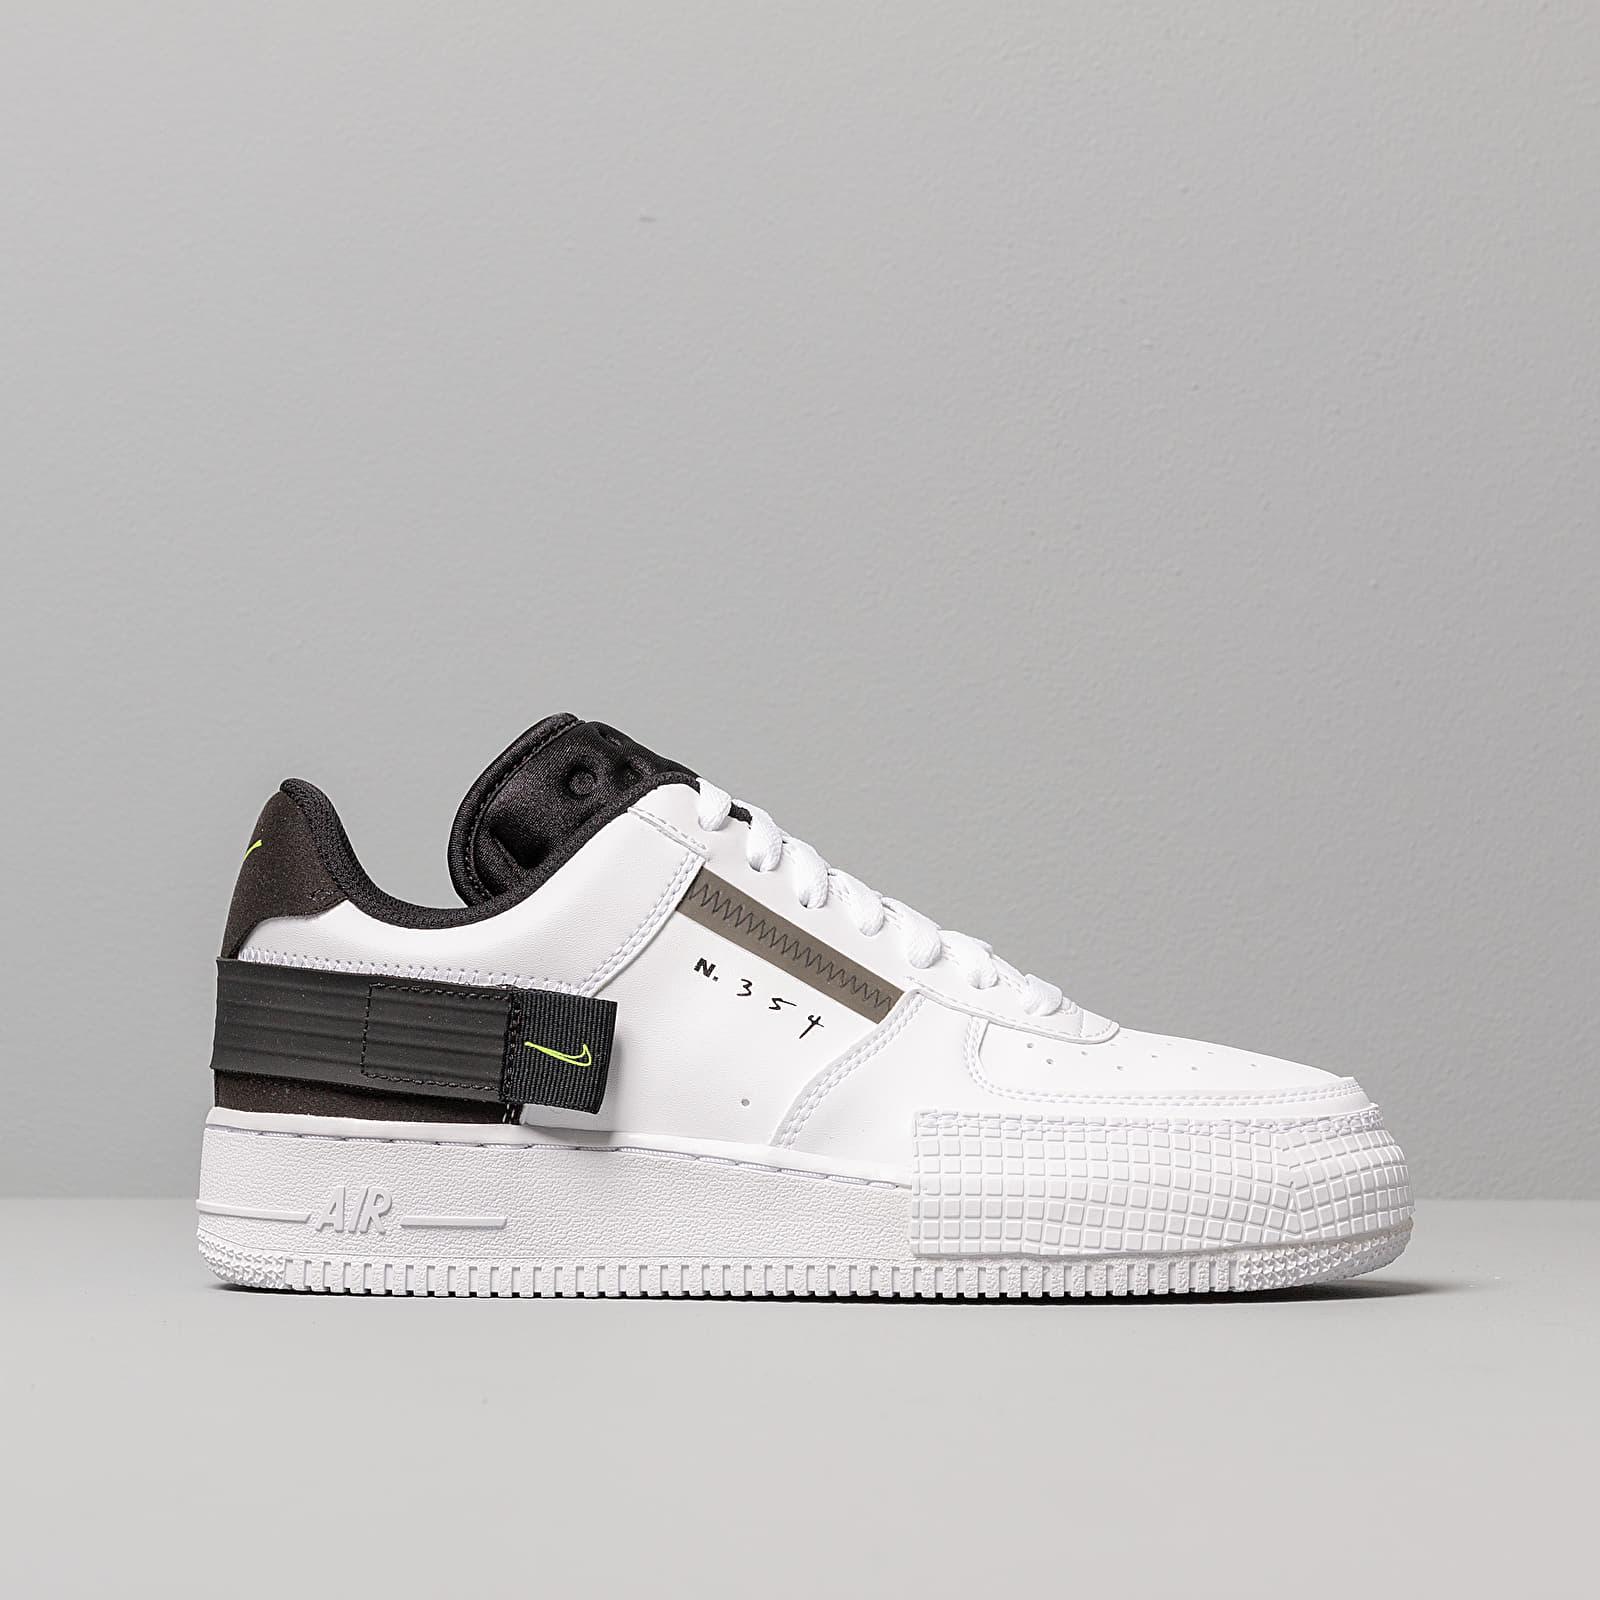 Nike Air Force 1 Type White Volt Black White | Footshop